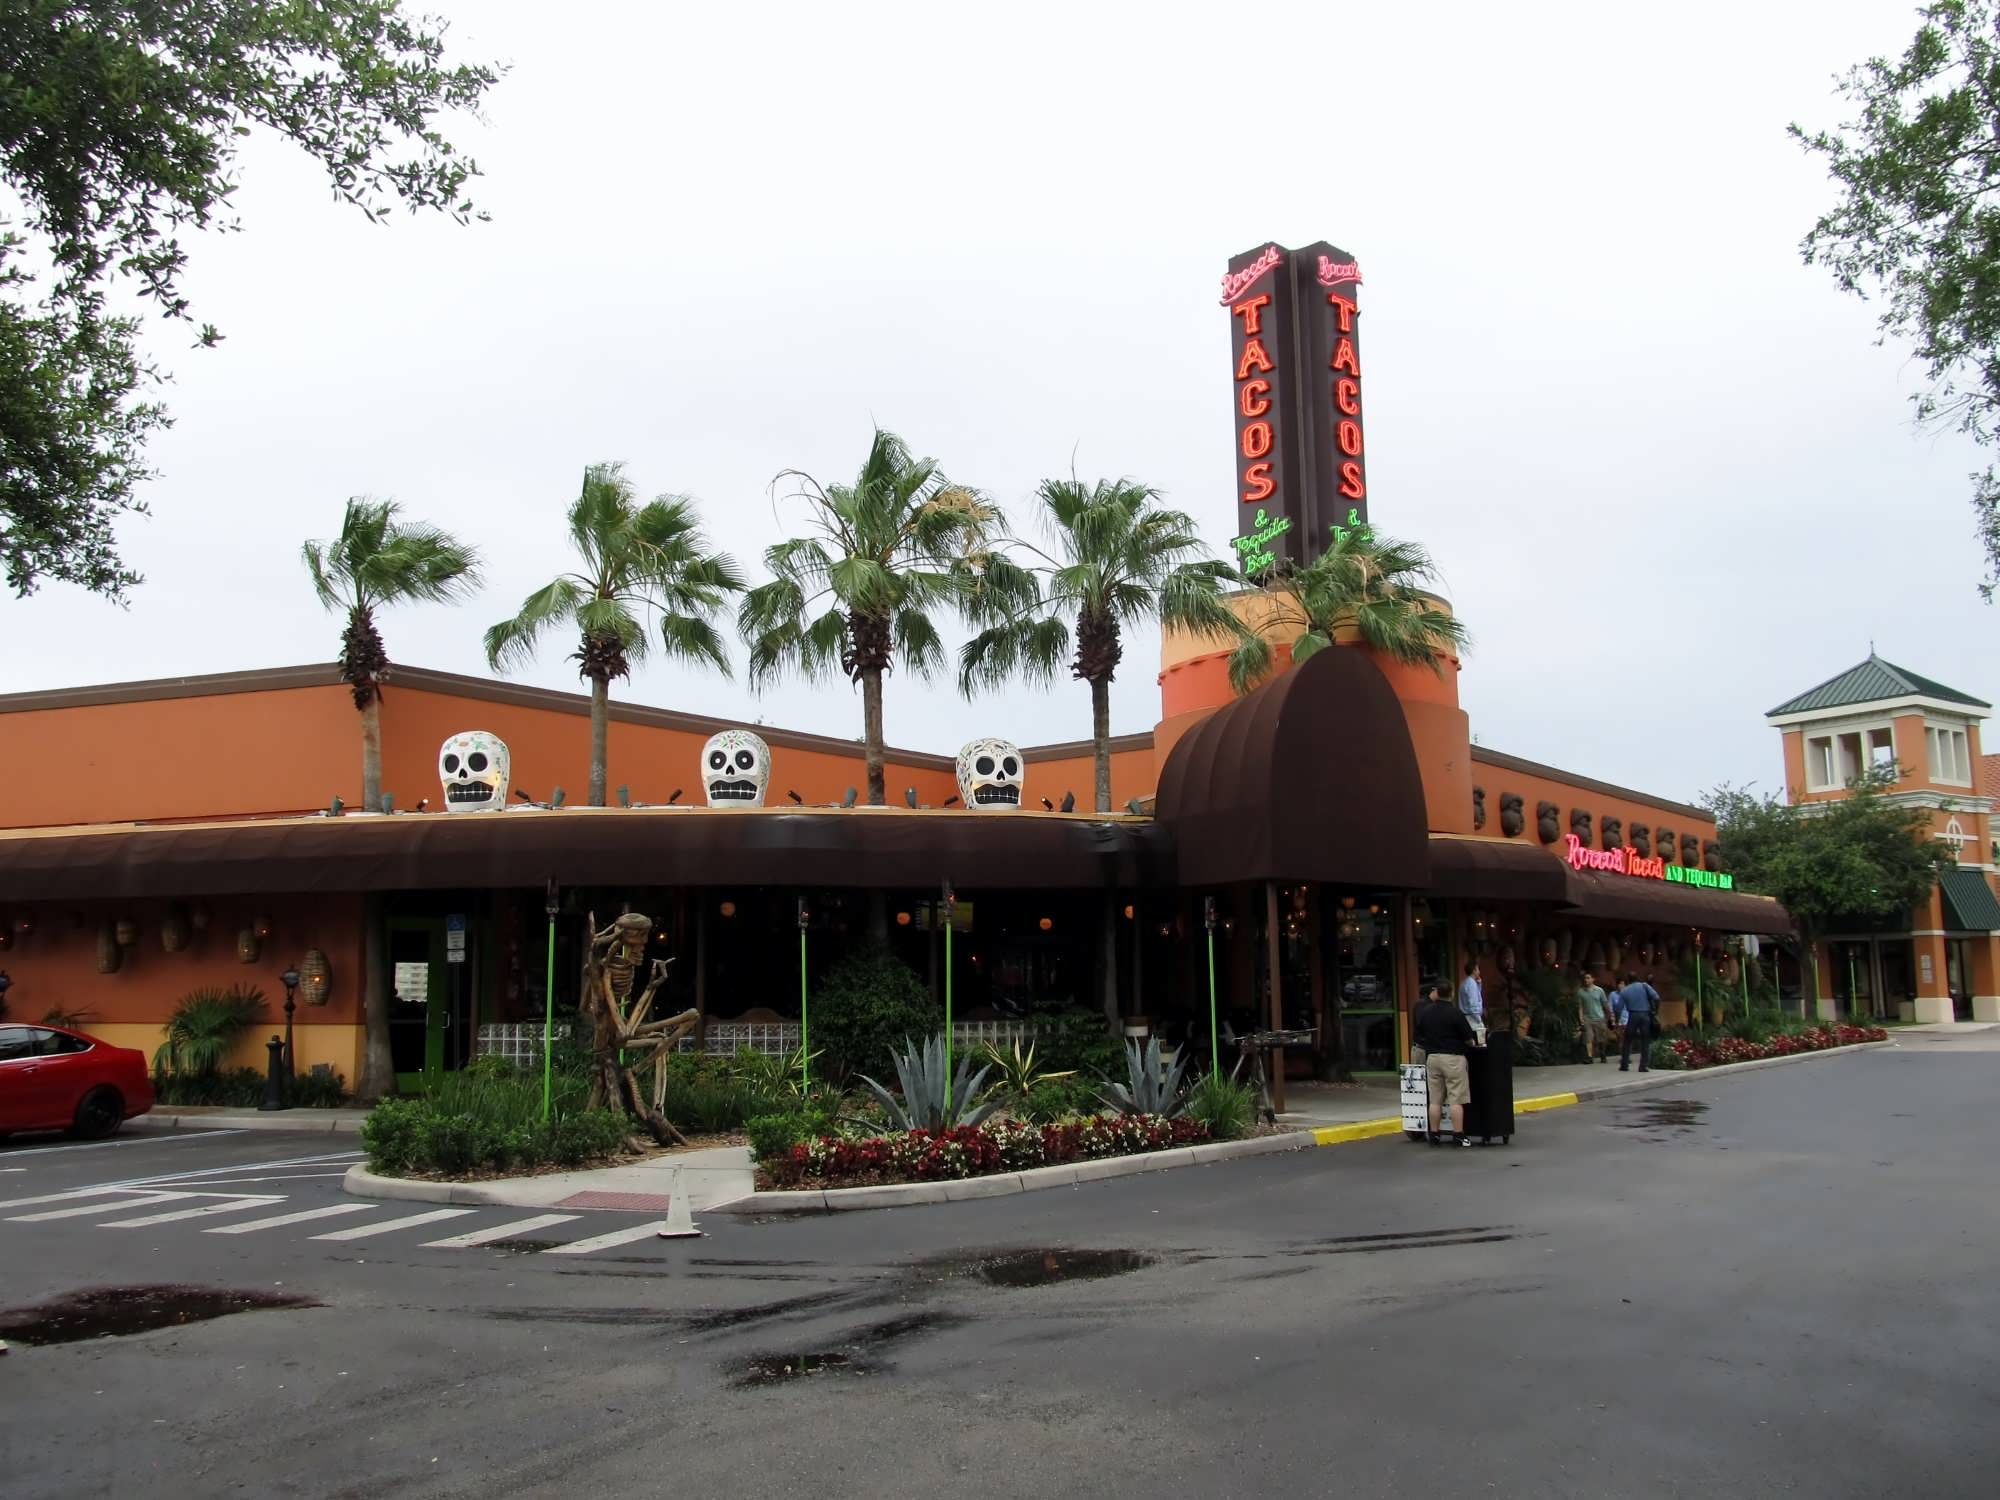 Restaurant Row Orlando Mexican